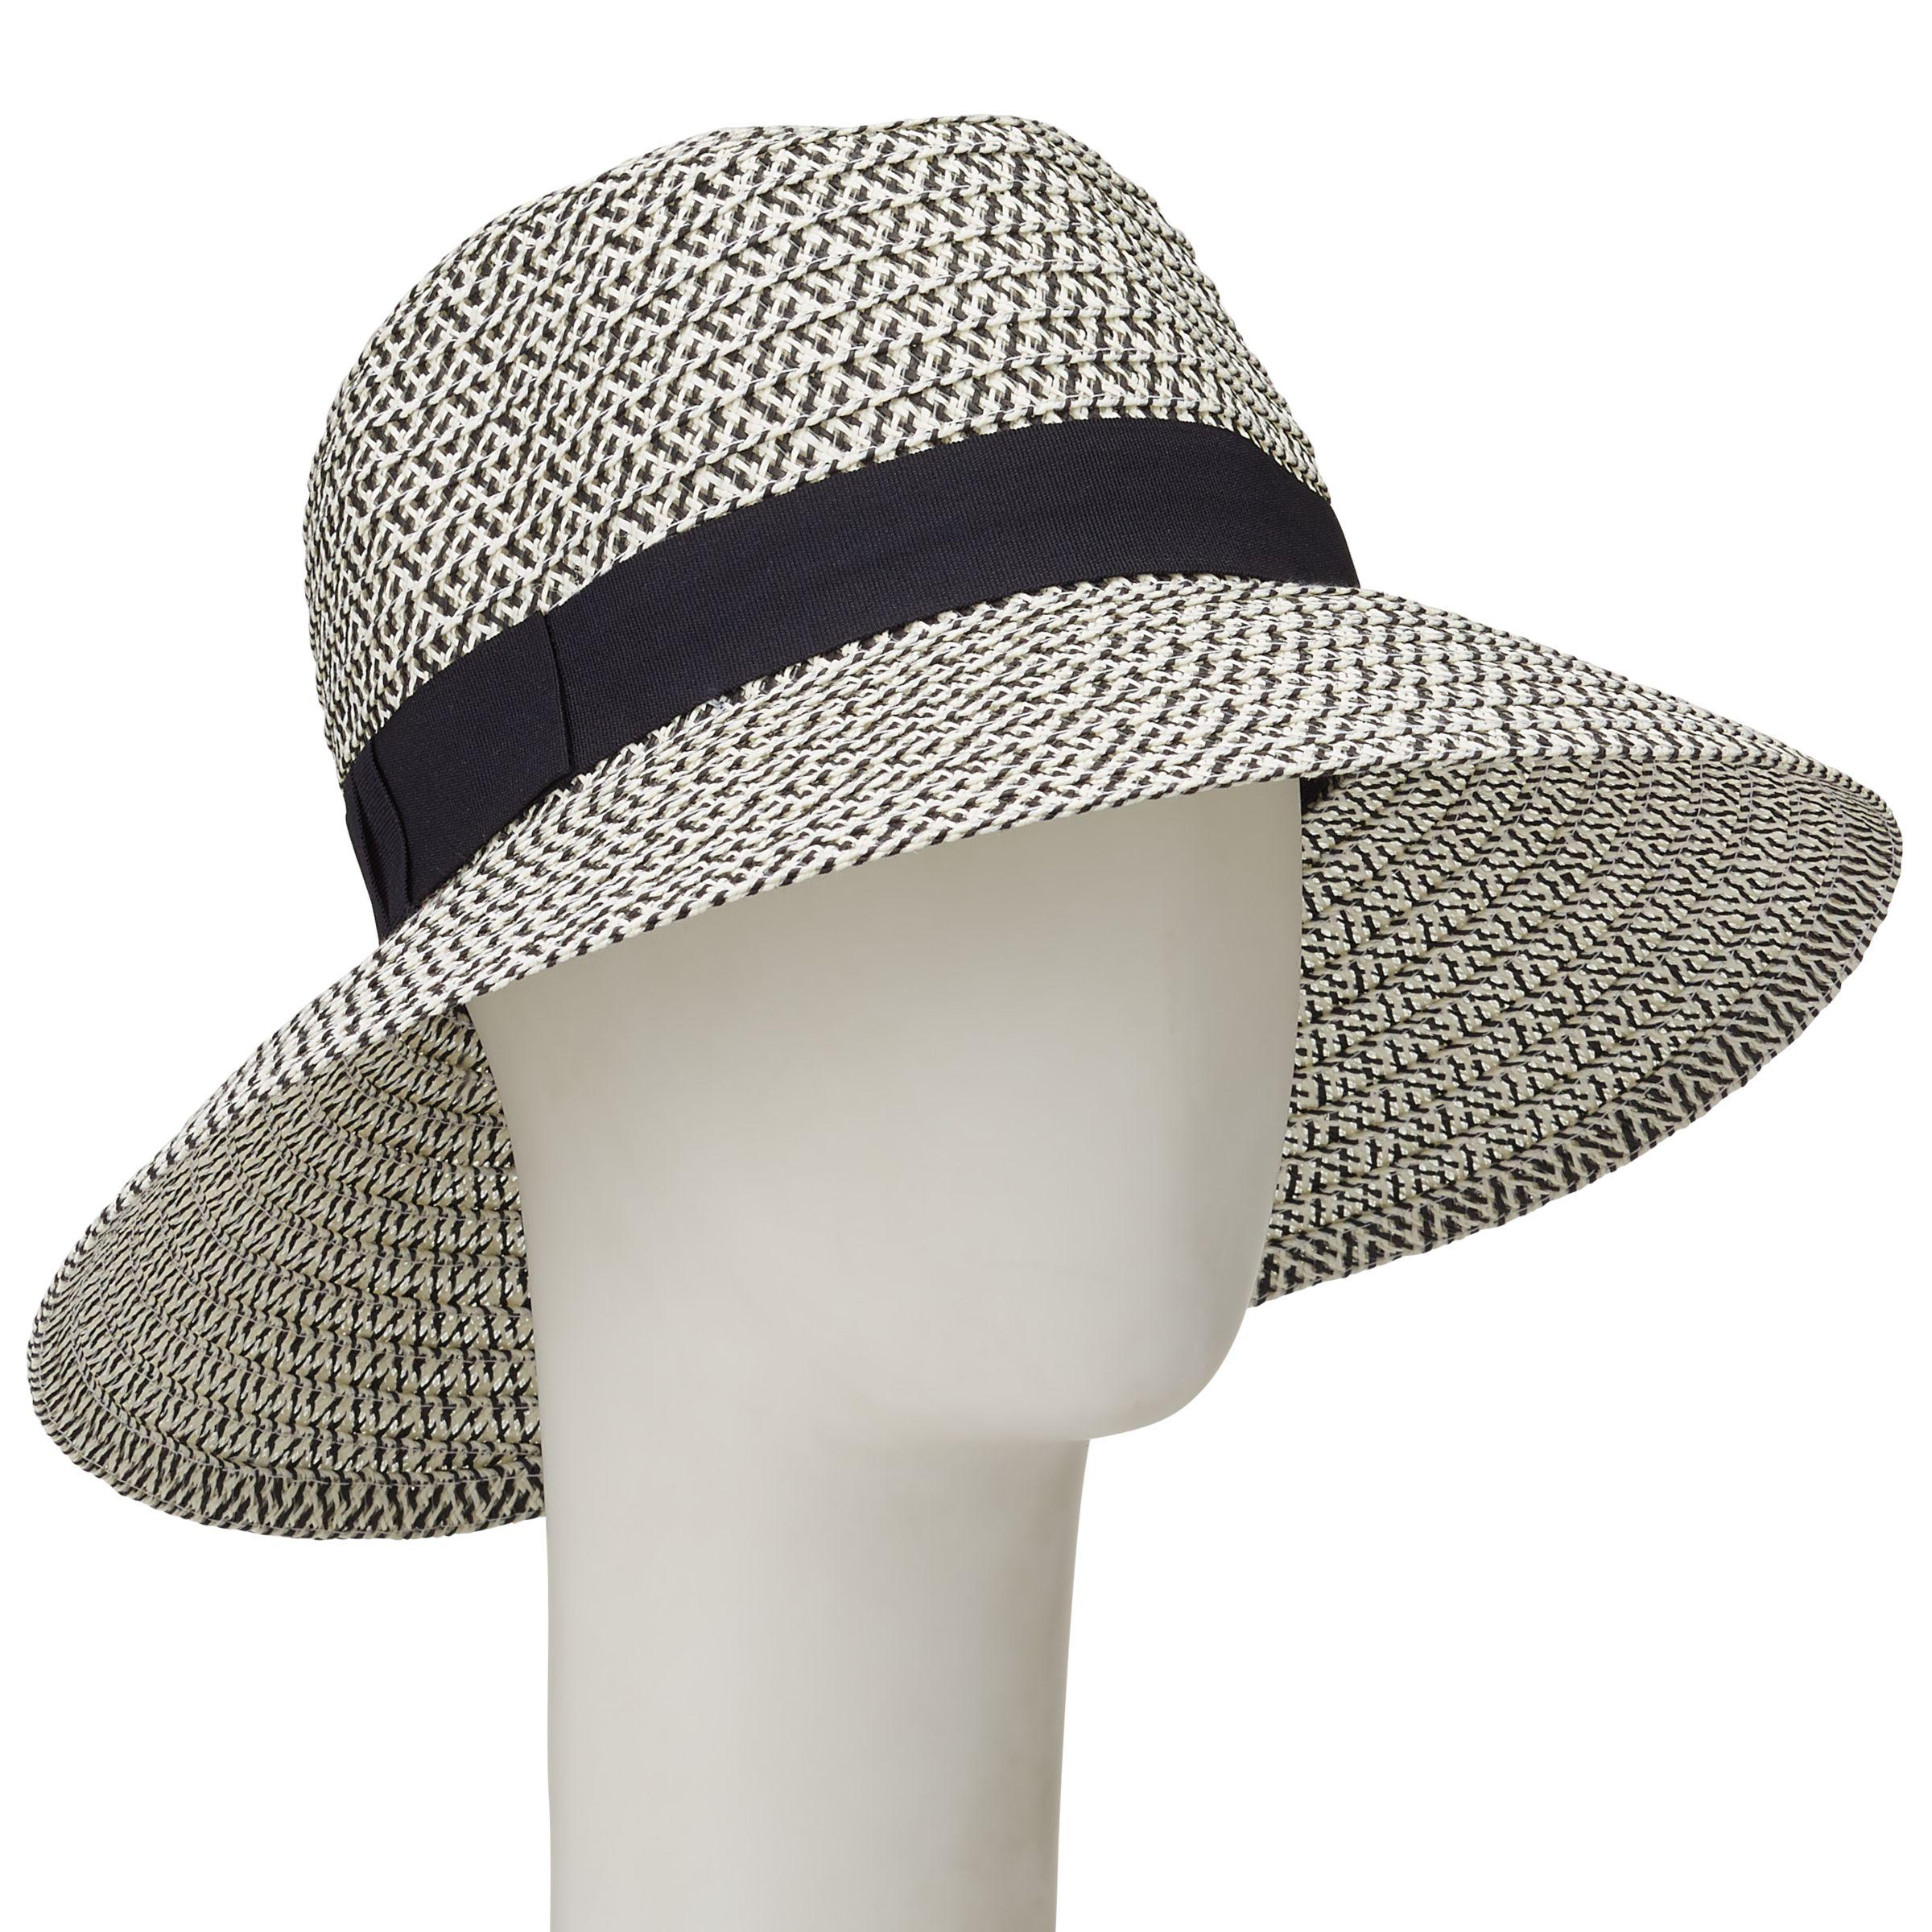 Sun Womens Hats John Lewis